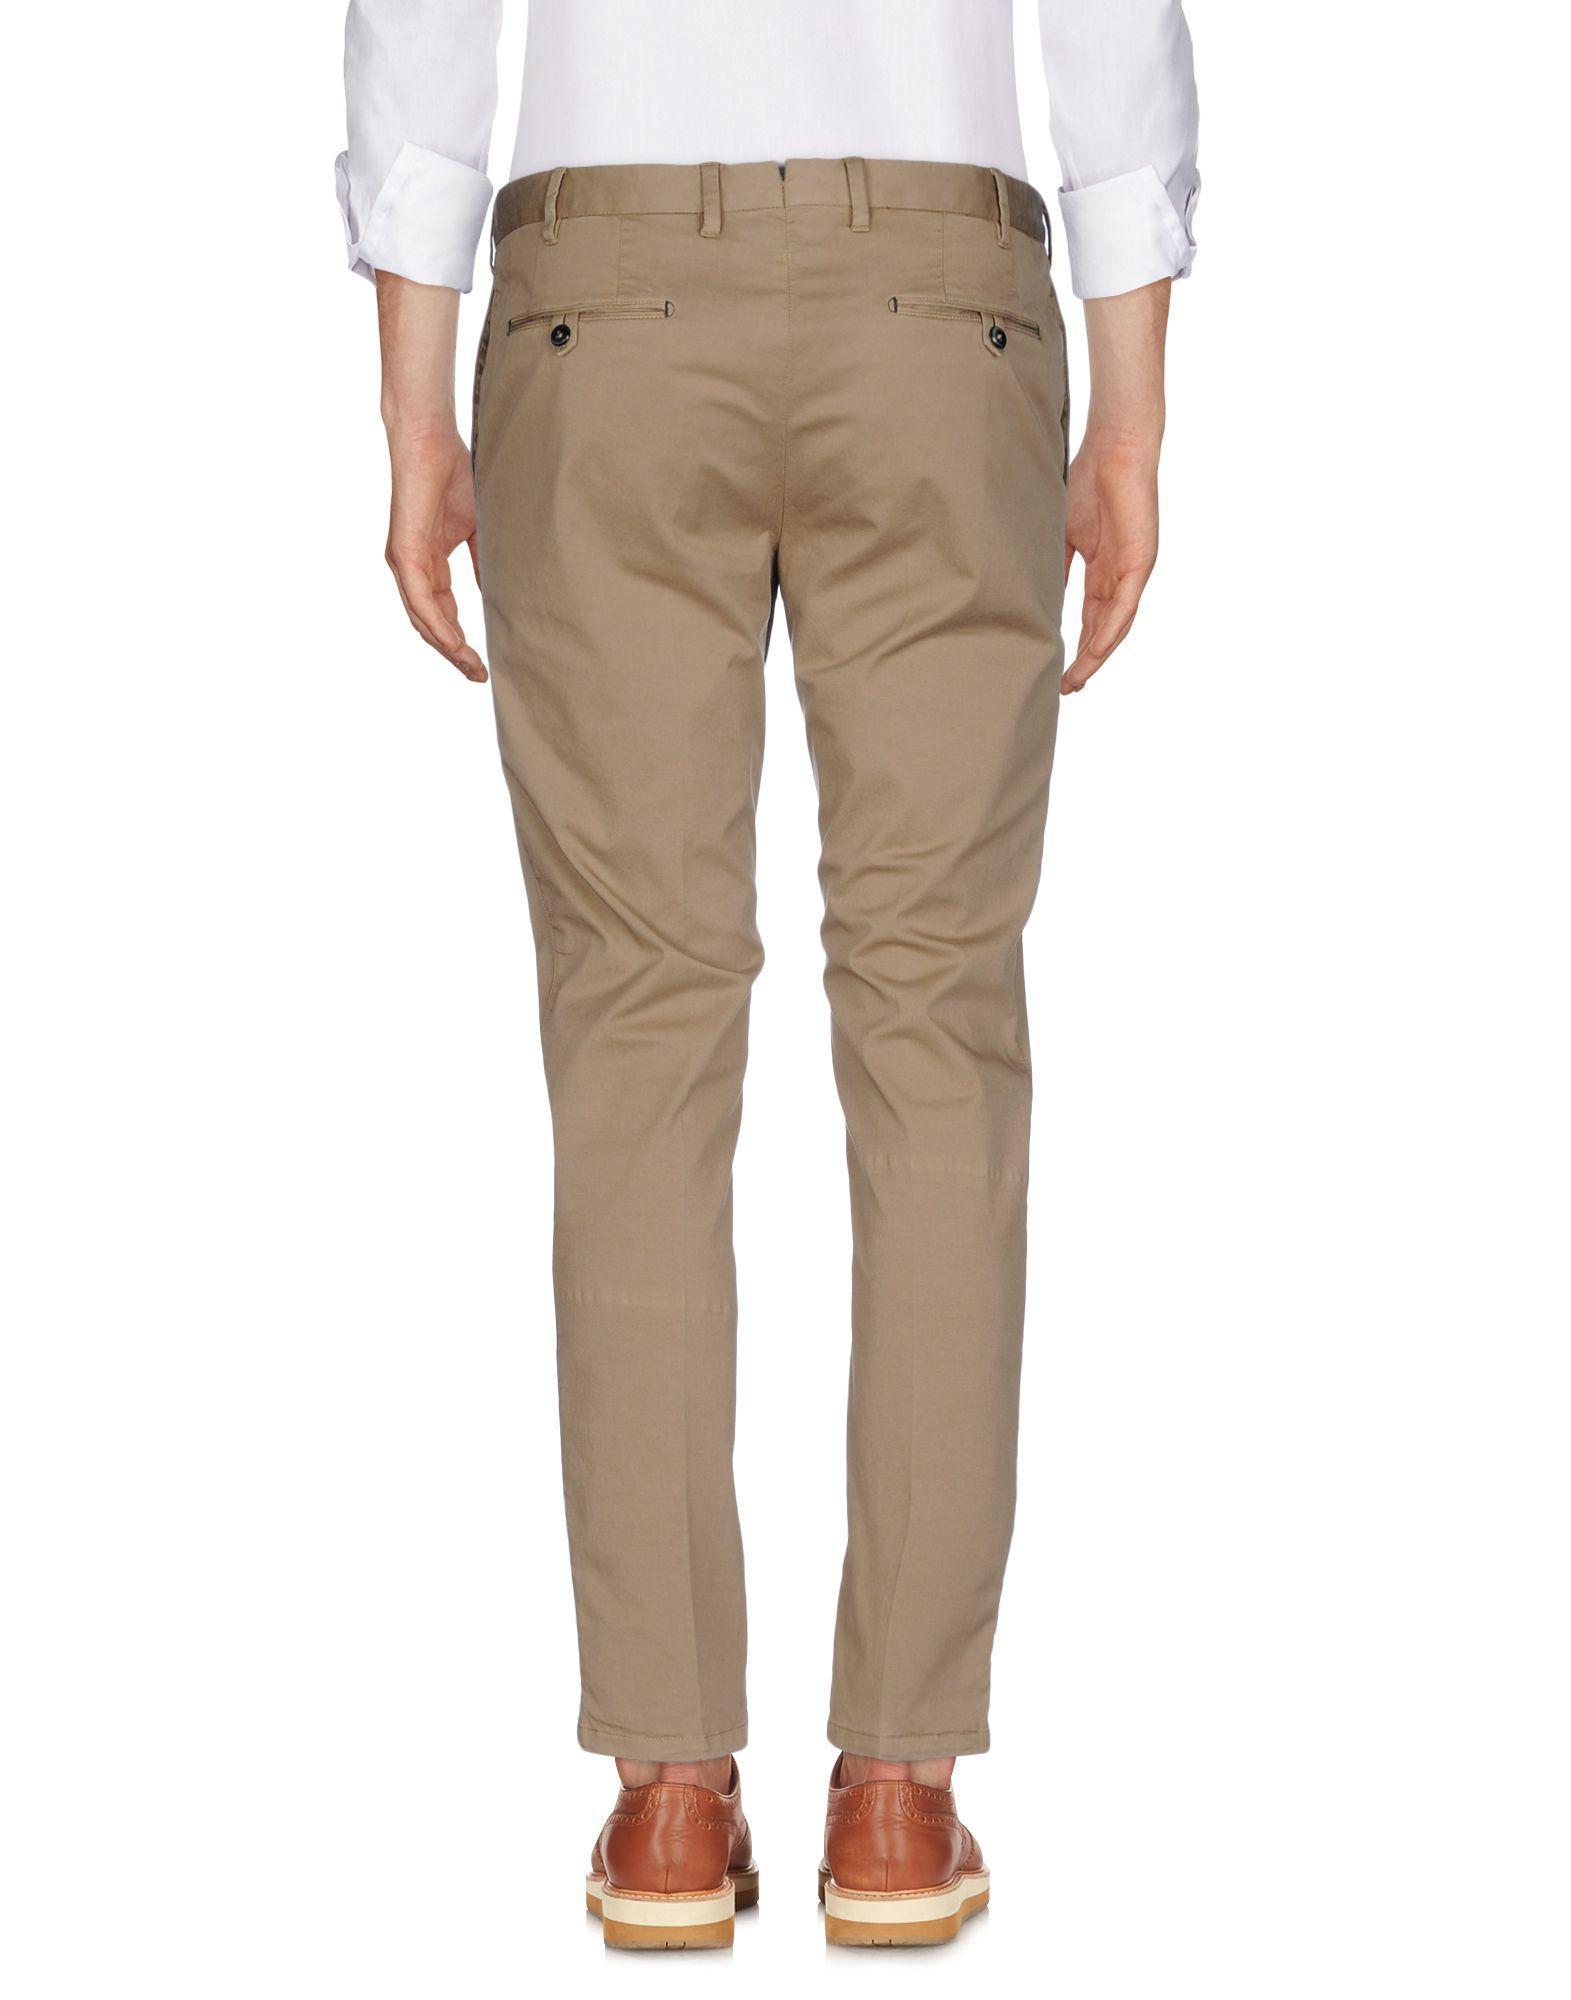 PT01 Cotton Casual Trouser in Khaki (Natural) for Men